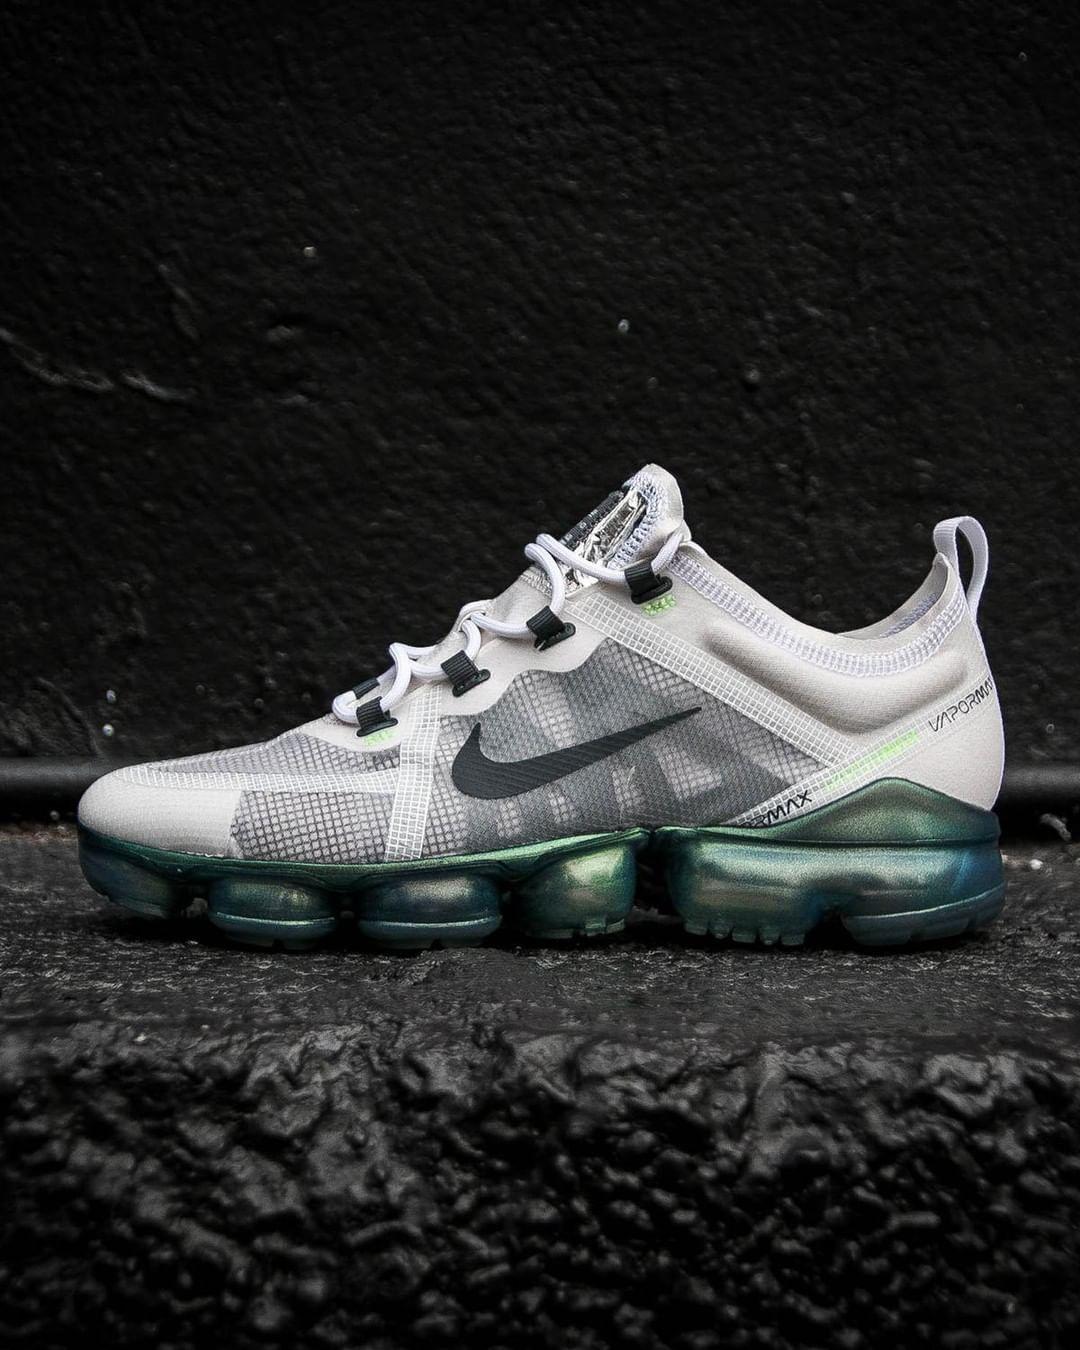 Nike Air vapormax 2019 in weiss AR6632 103 | Sneaker trend